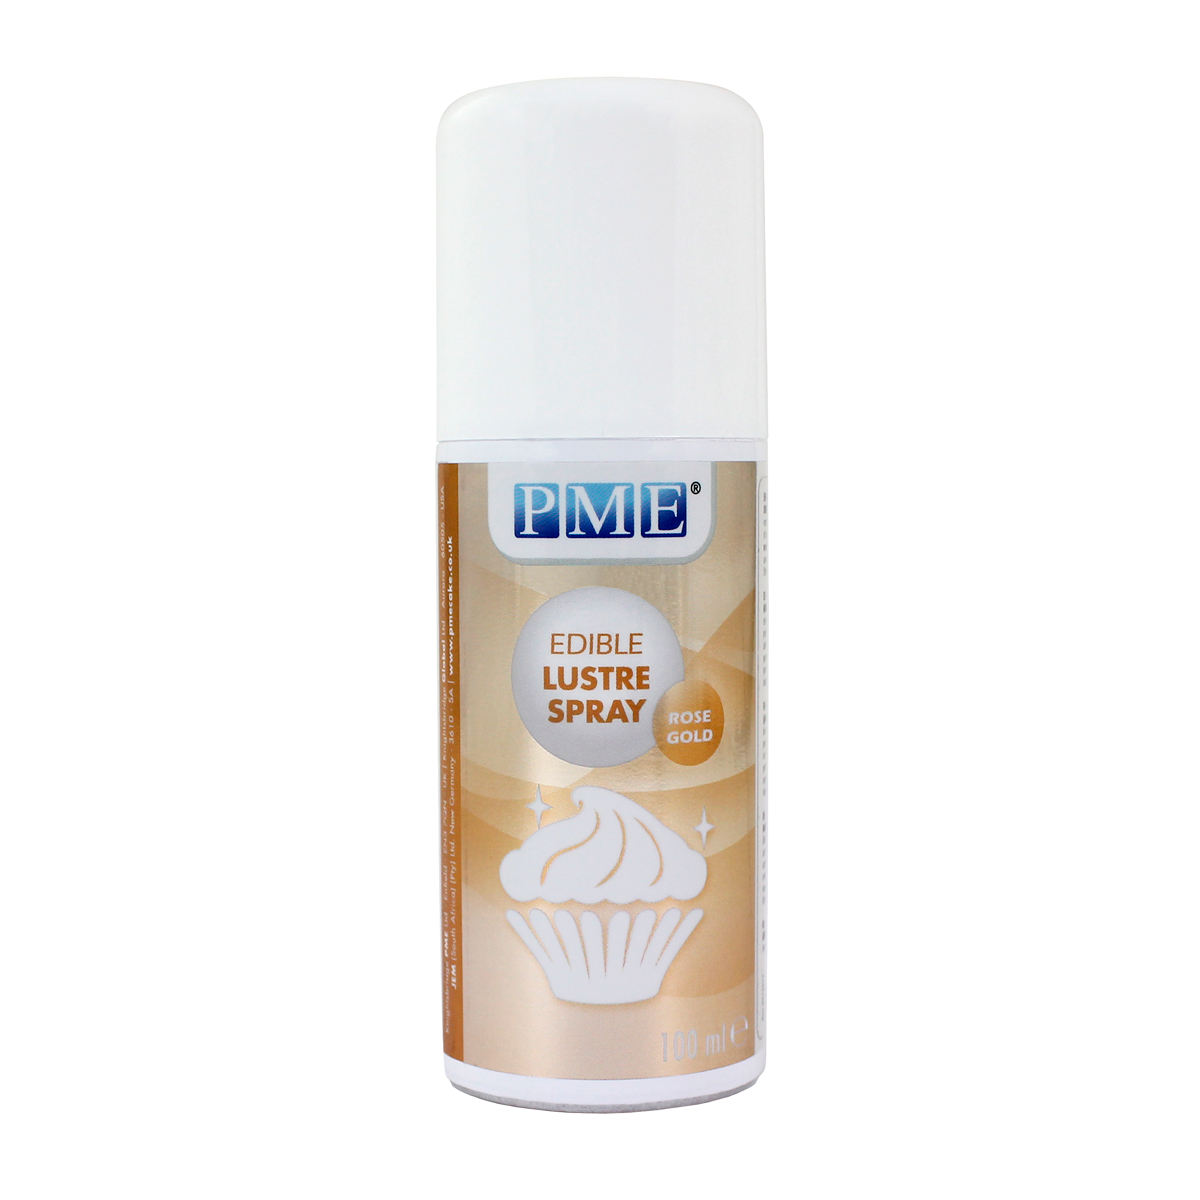 Spray Rose Gold PME